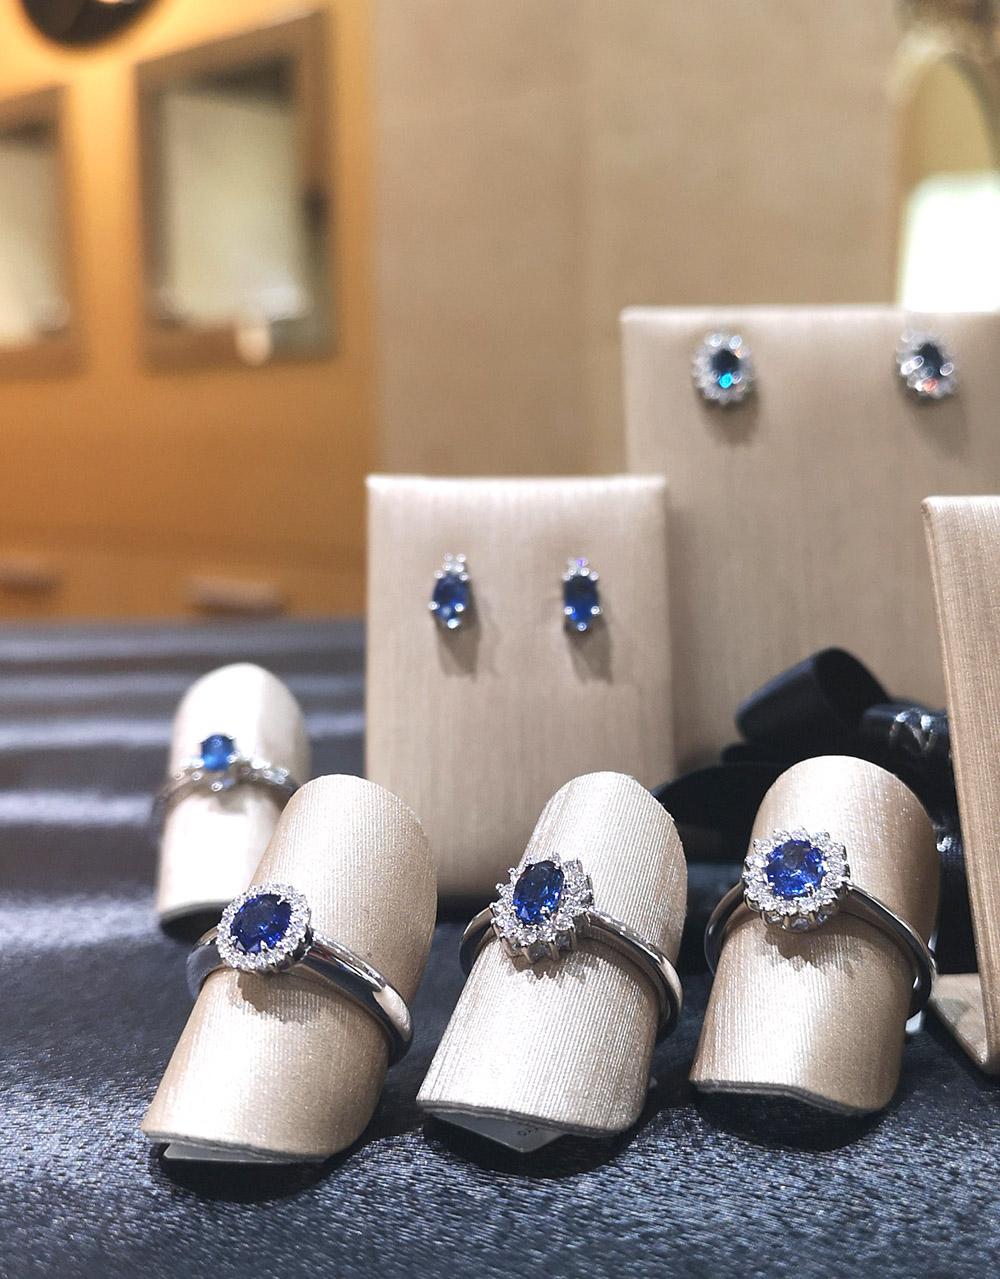 joyas oro blanco y zafiro azul - anillos zafiro azul - pendientes zafiro azul - colgantes zafiro azul